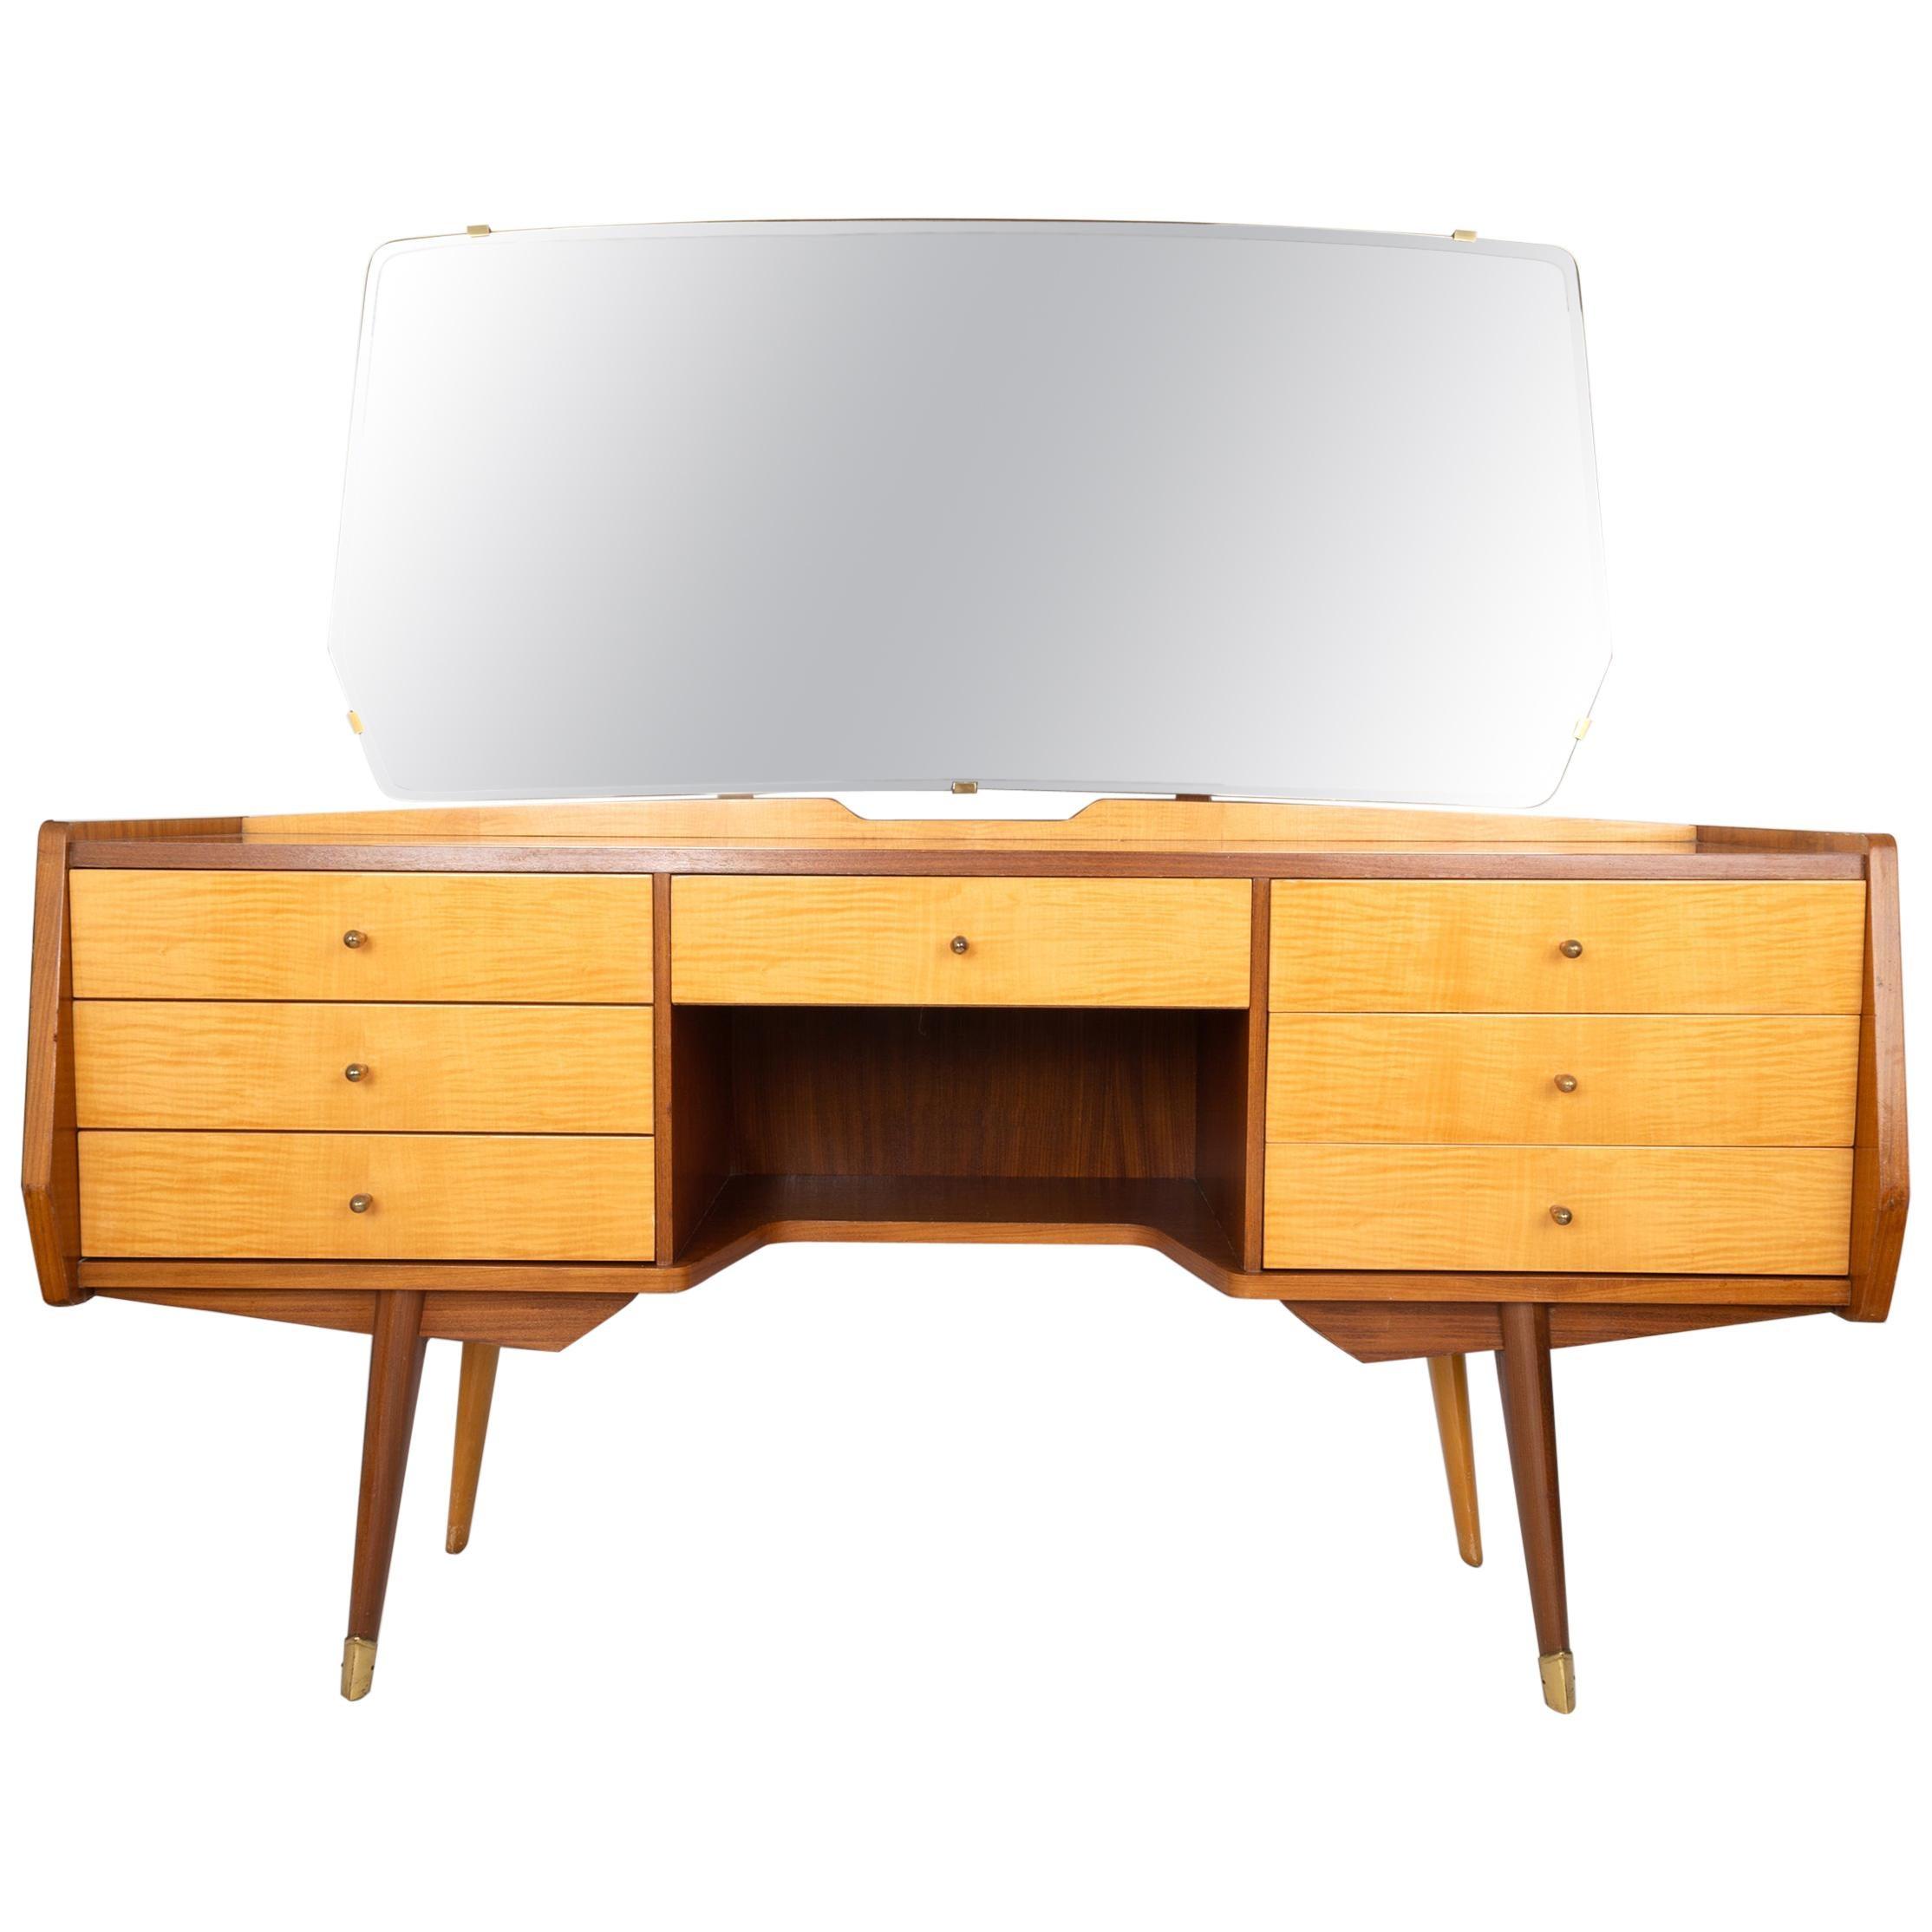 Mid Century Sycamore & Walnut Dressing Table / Vanity Table, Italy, C.1950